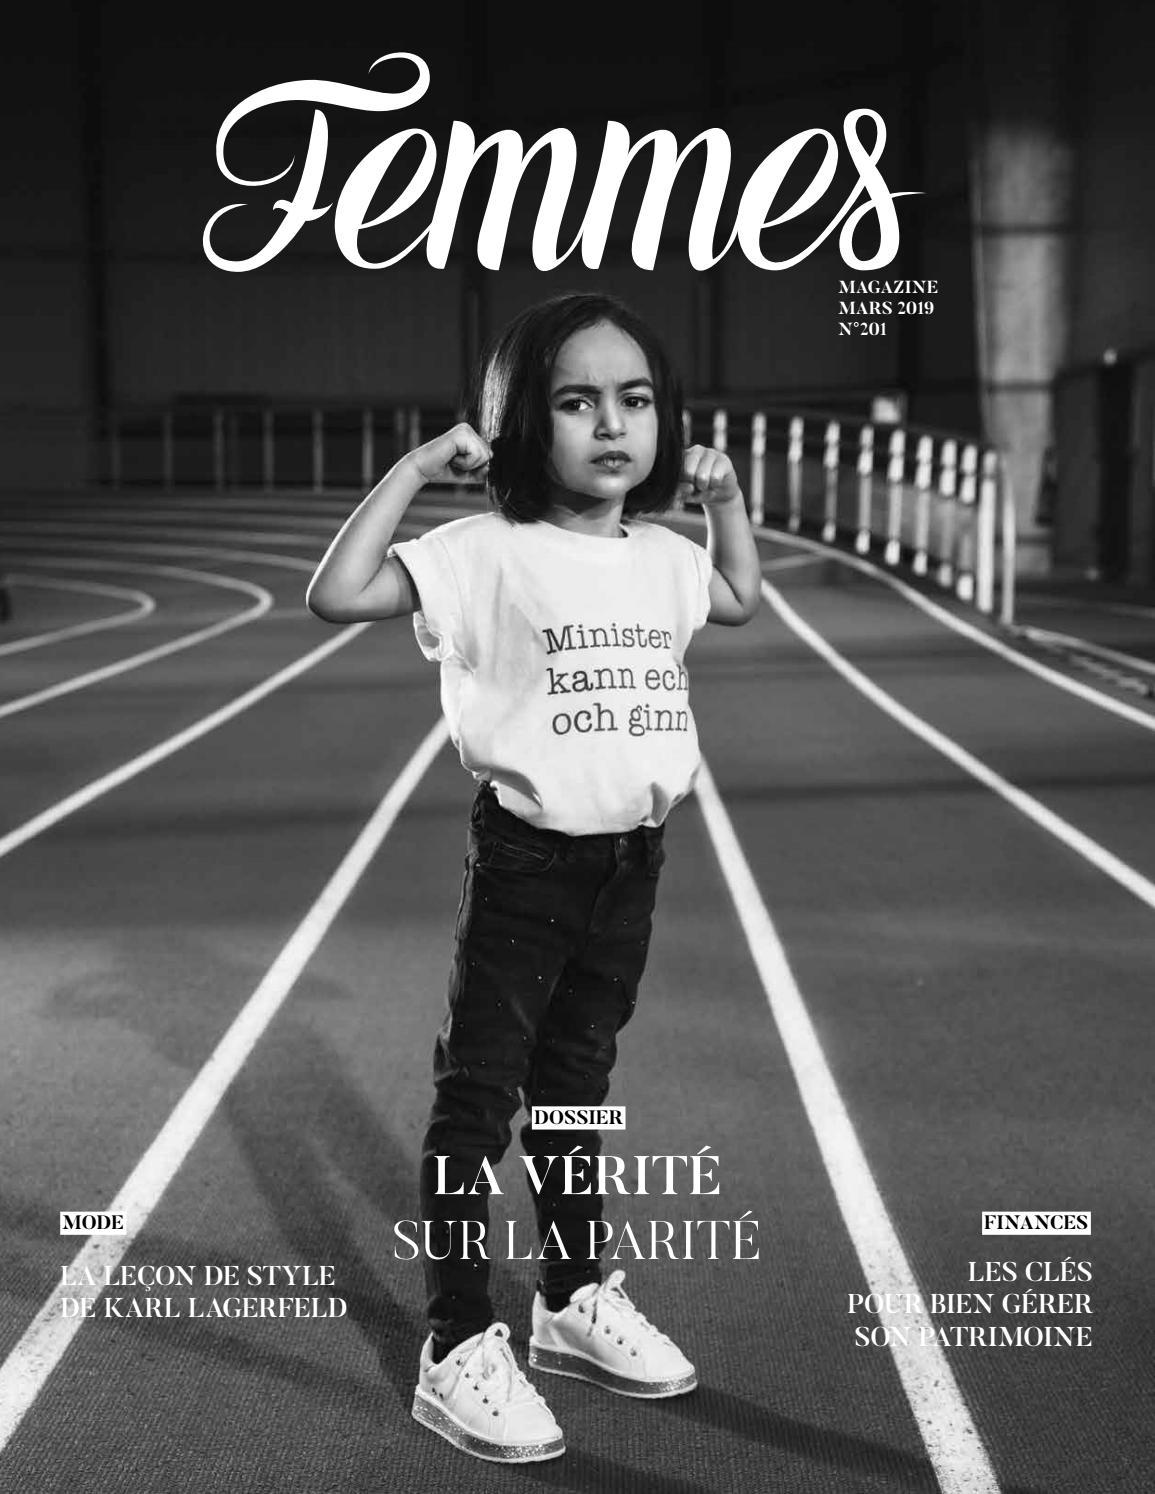 21f844245d713 Femmes magazine 201 by alinea communication - issuu